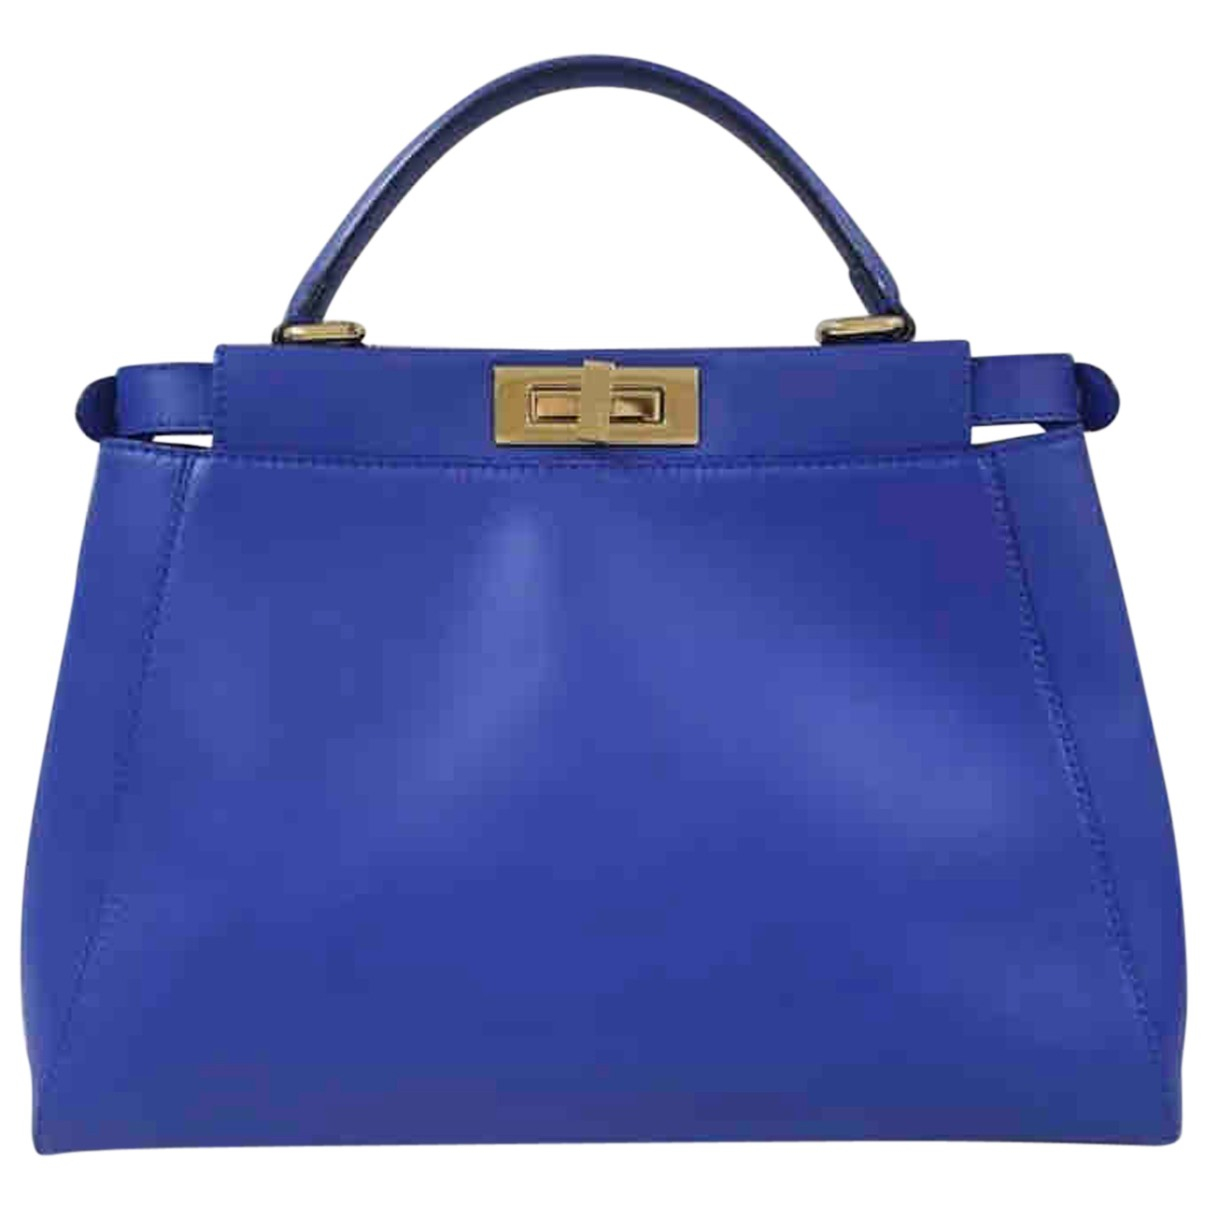 Fendi Peekaboo Blue Leather handbag for Women N